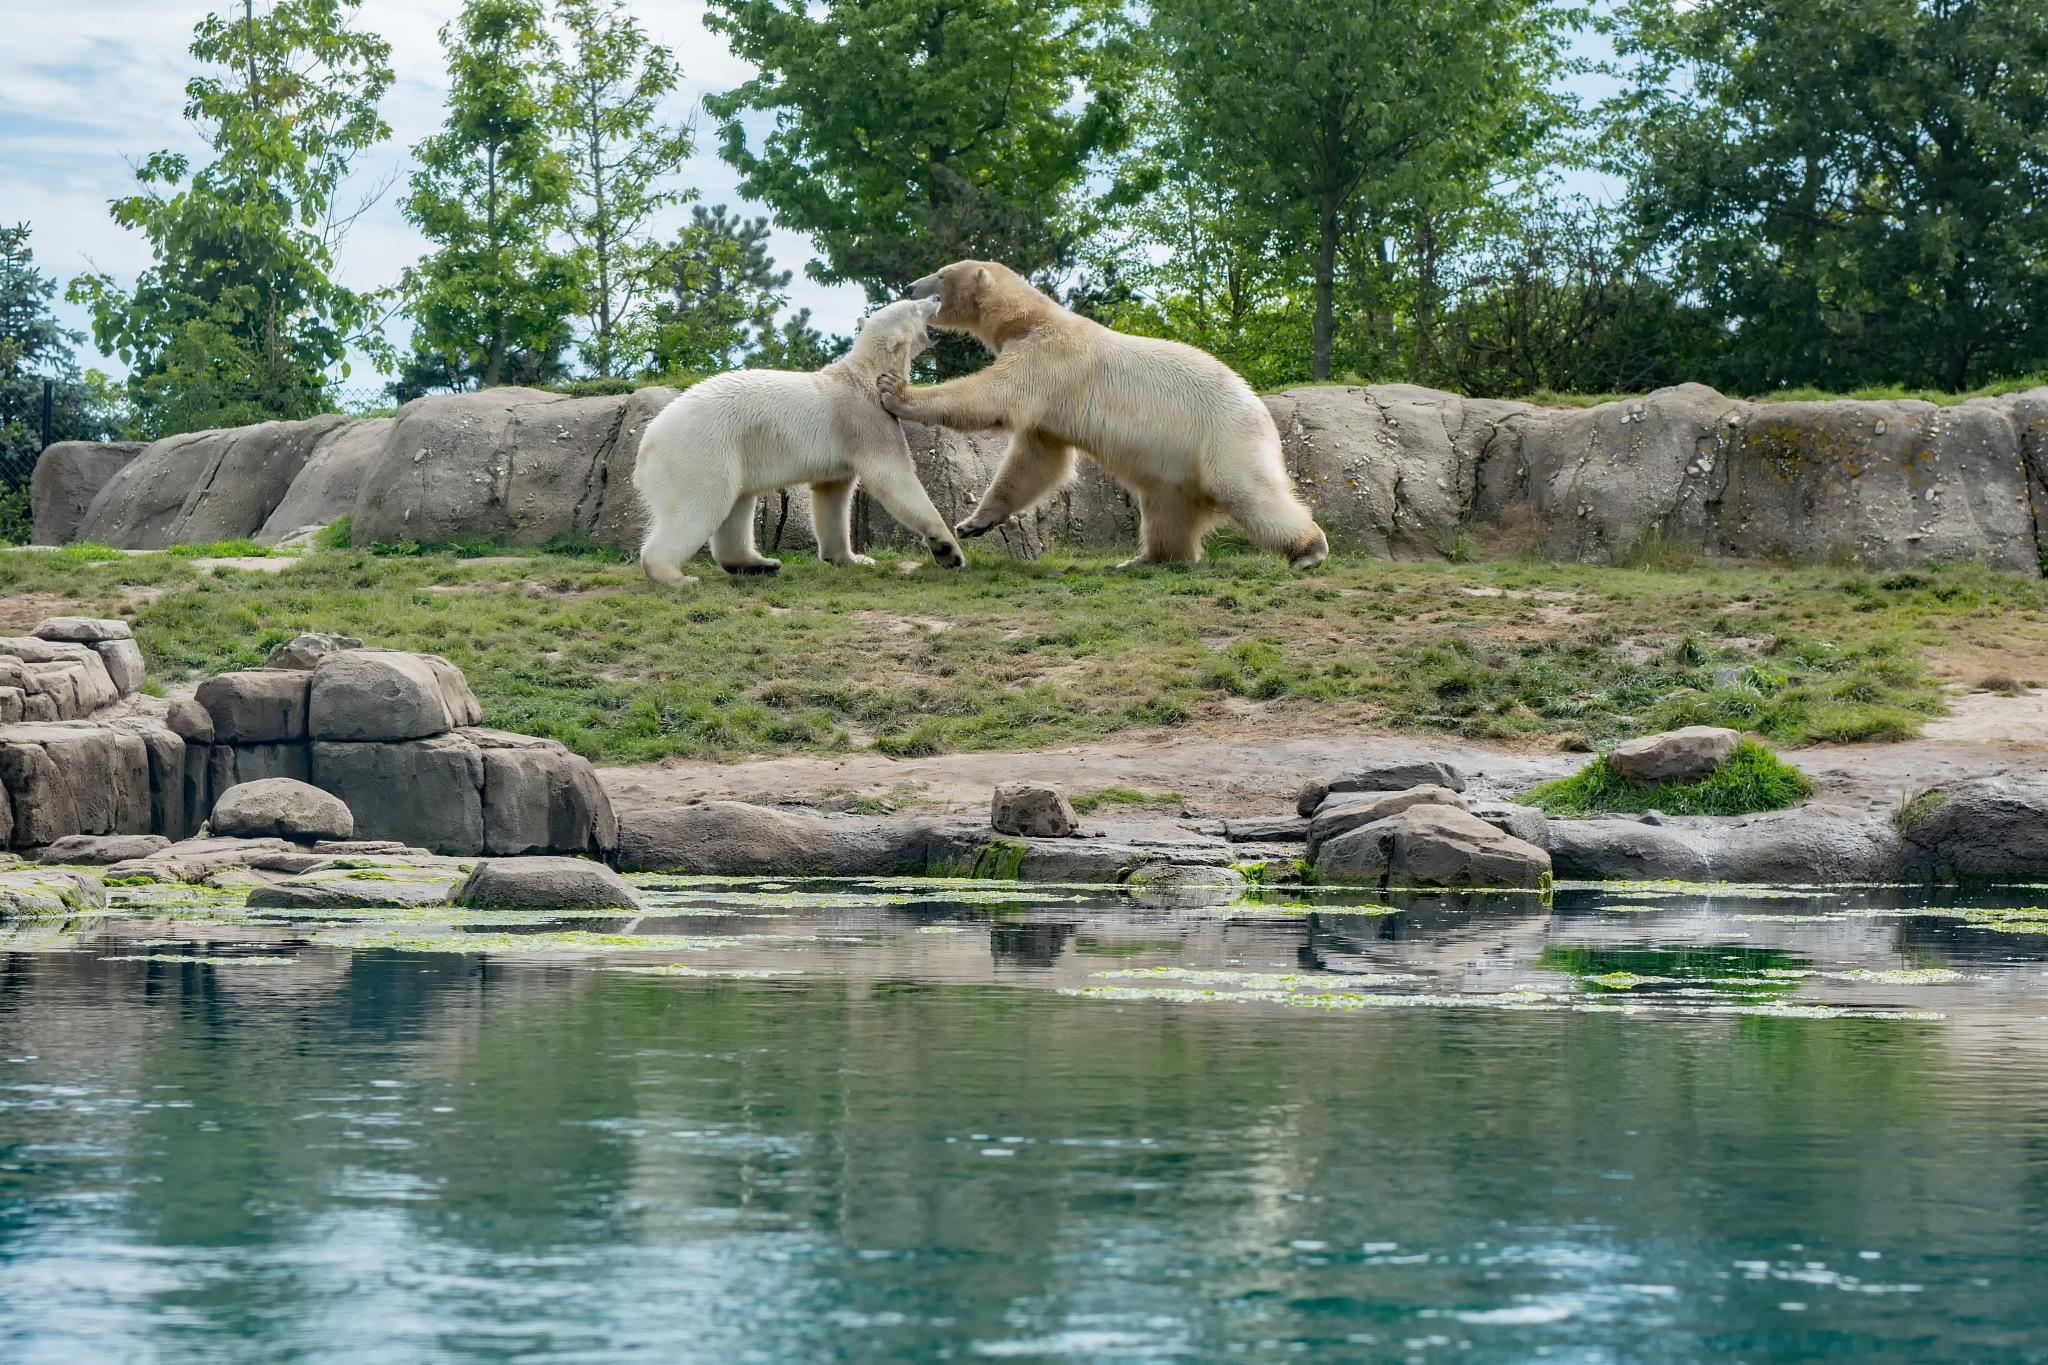 Playing polar bears by HaWaFoTo